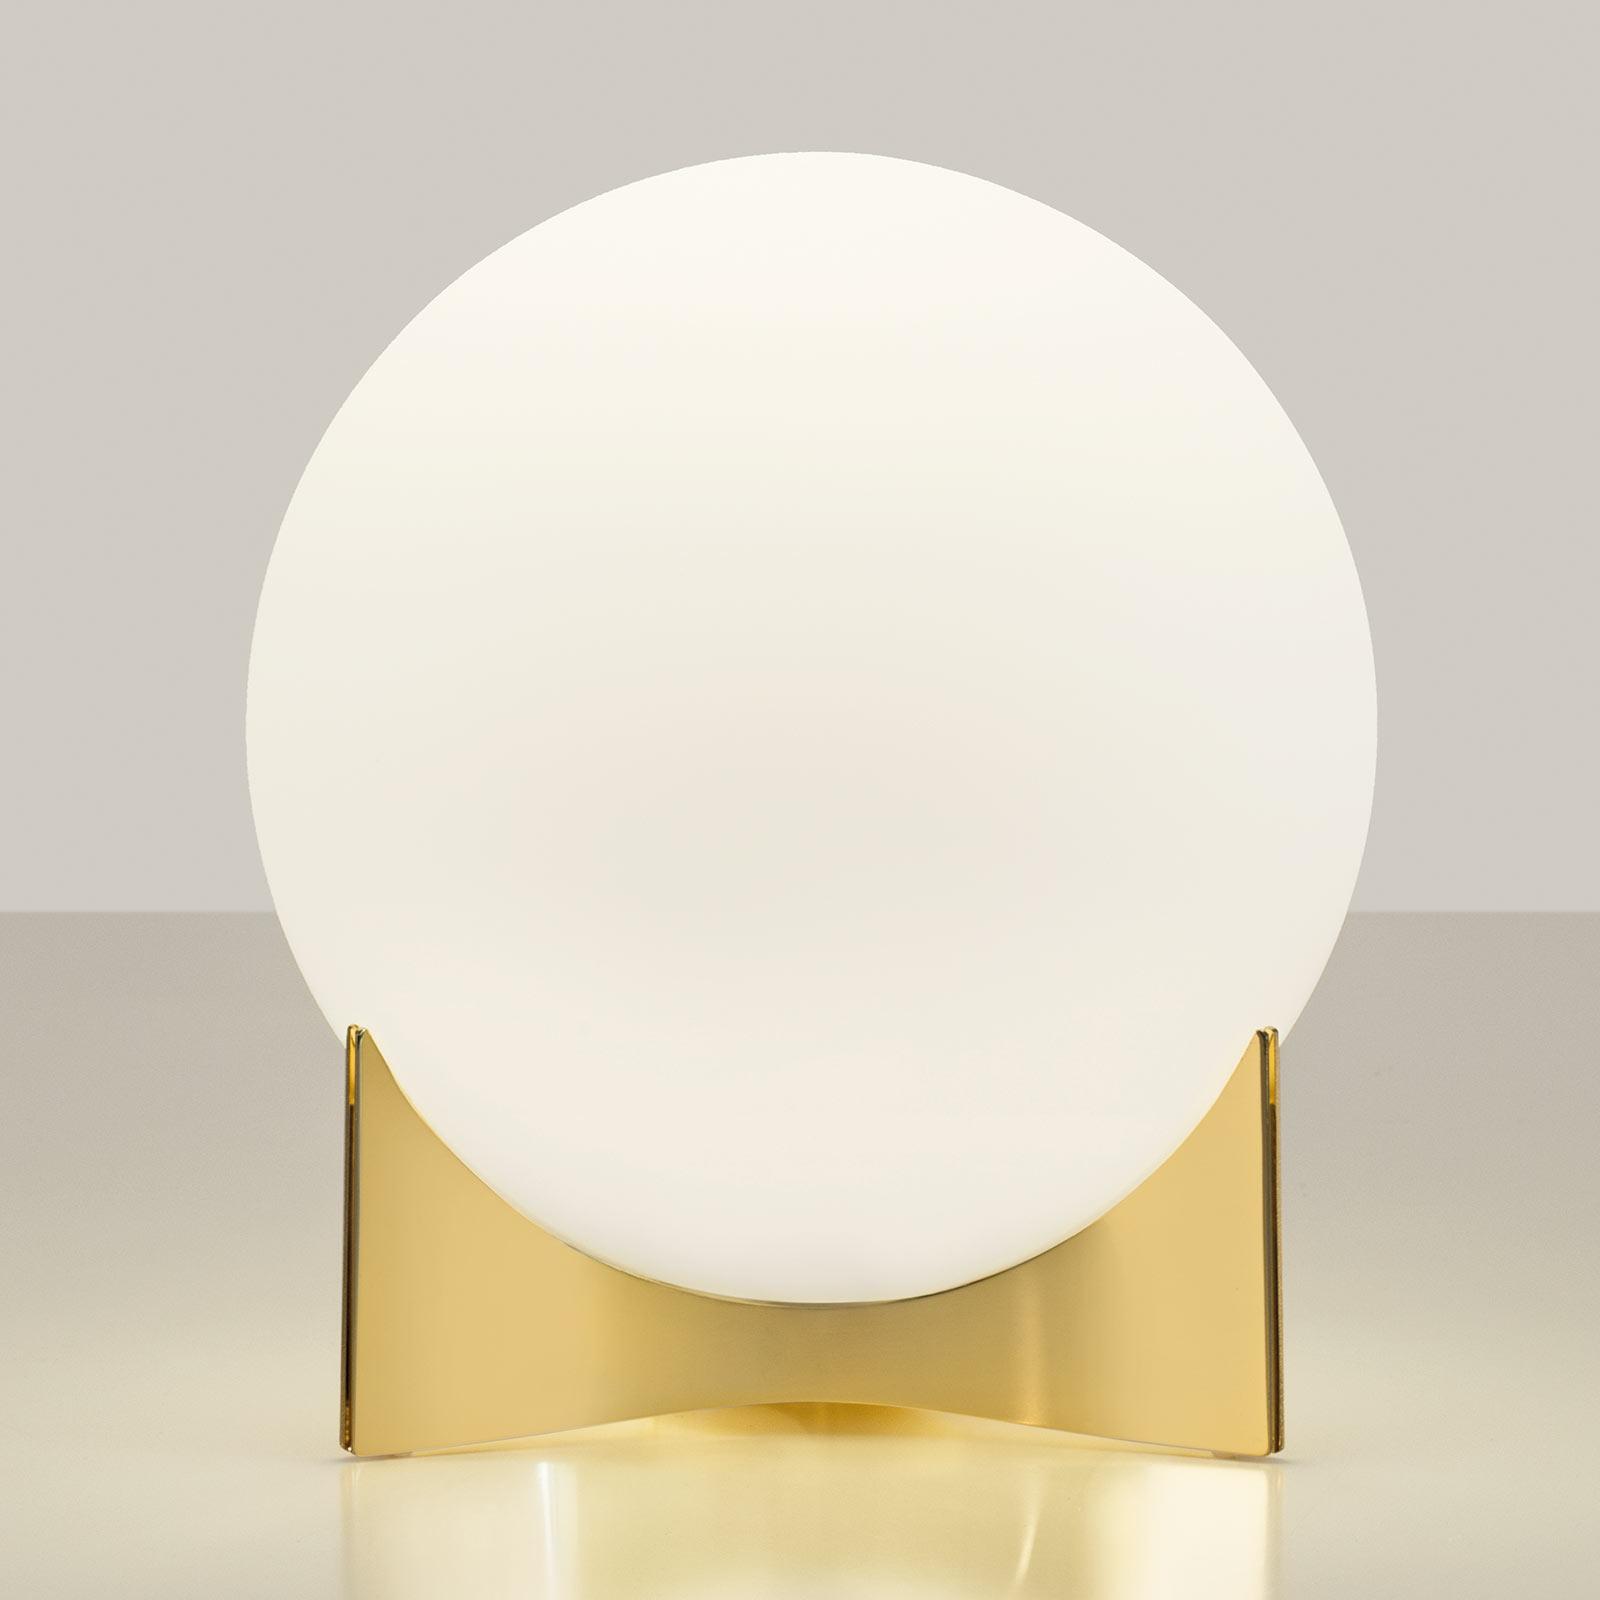 Terzani Oscar tafellamp van glas, goud